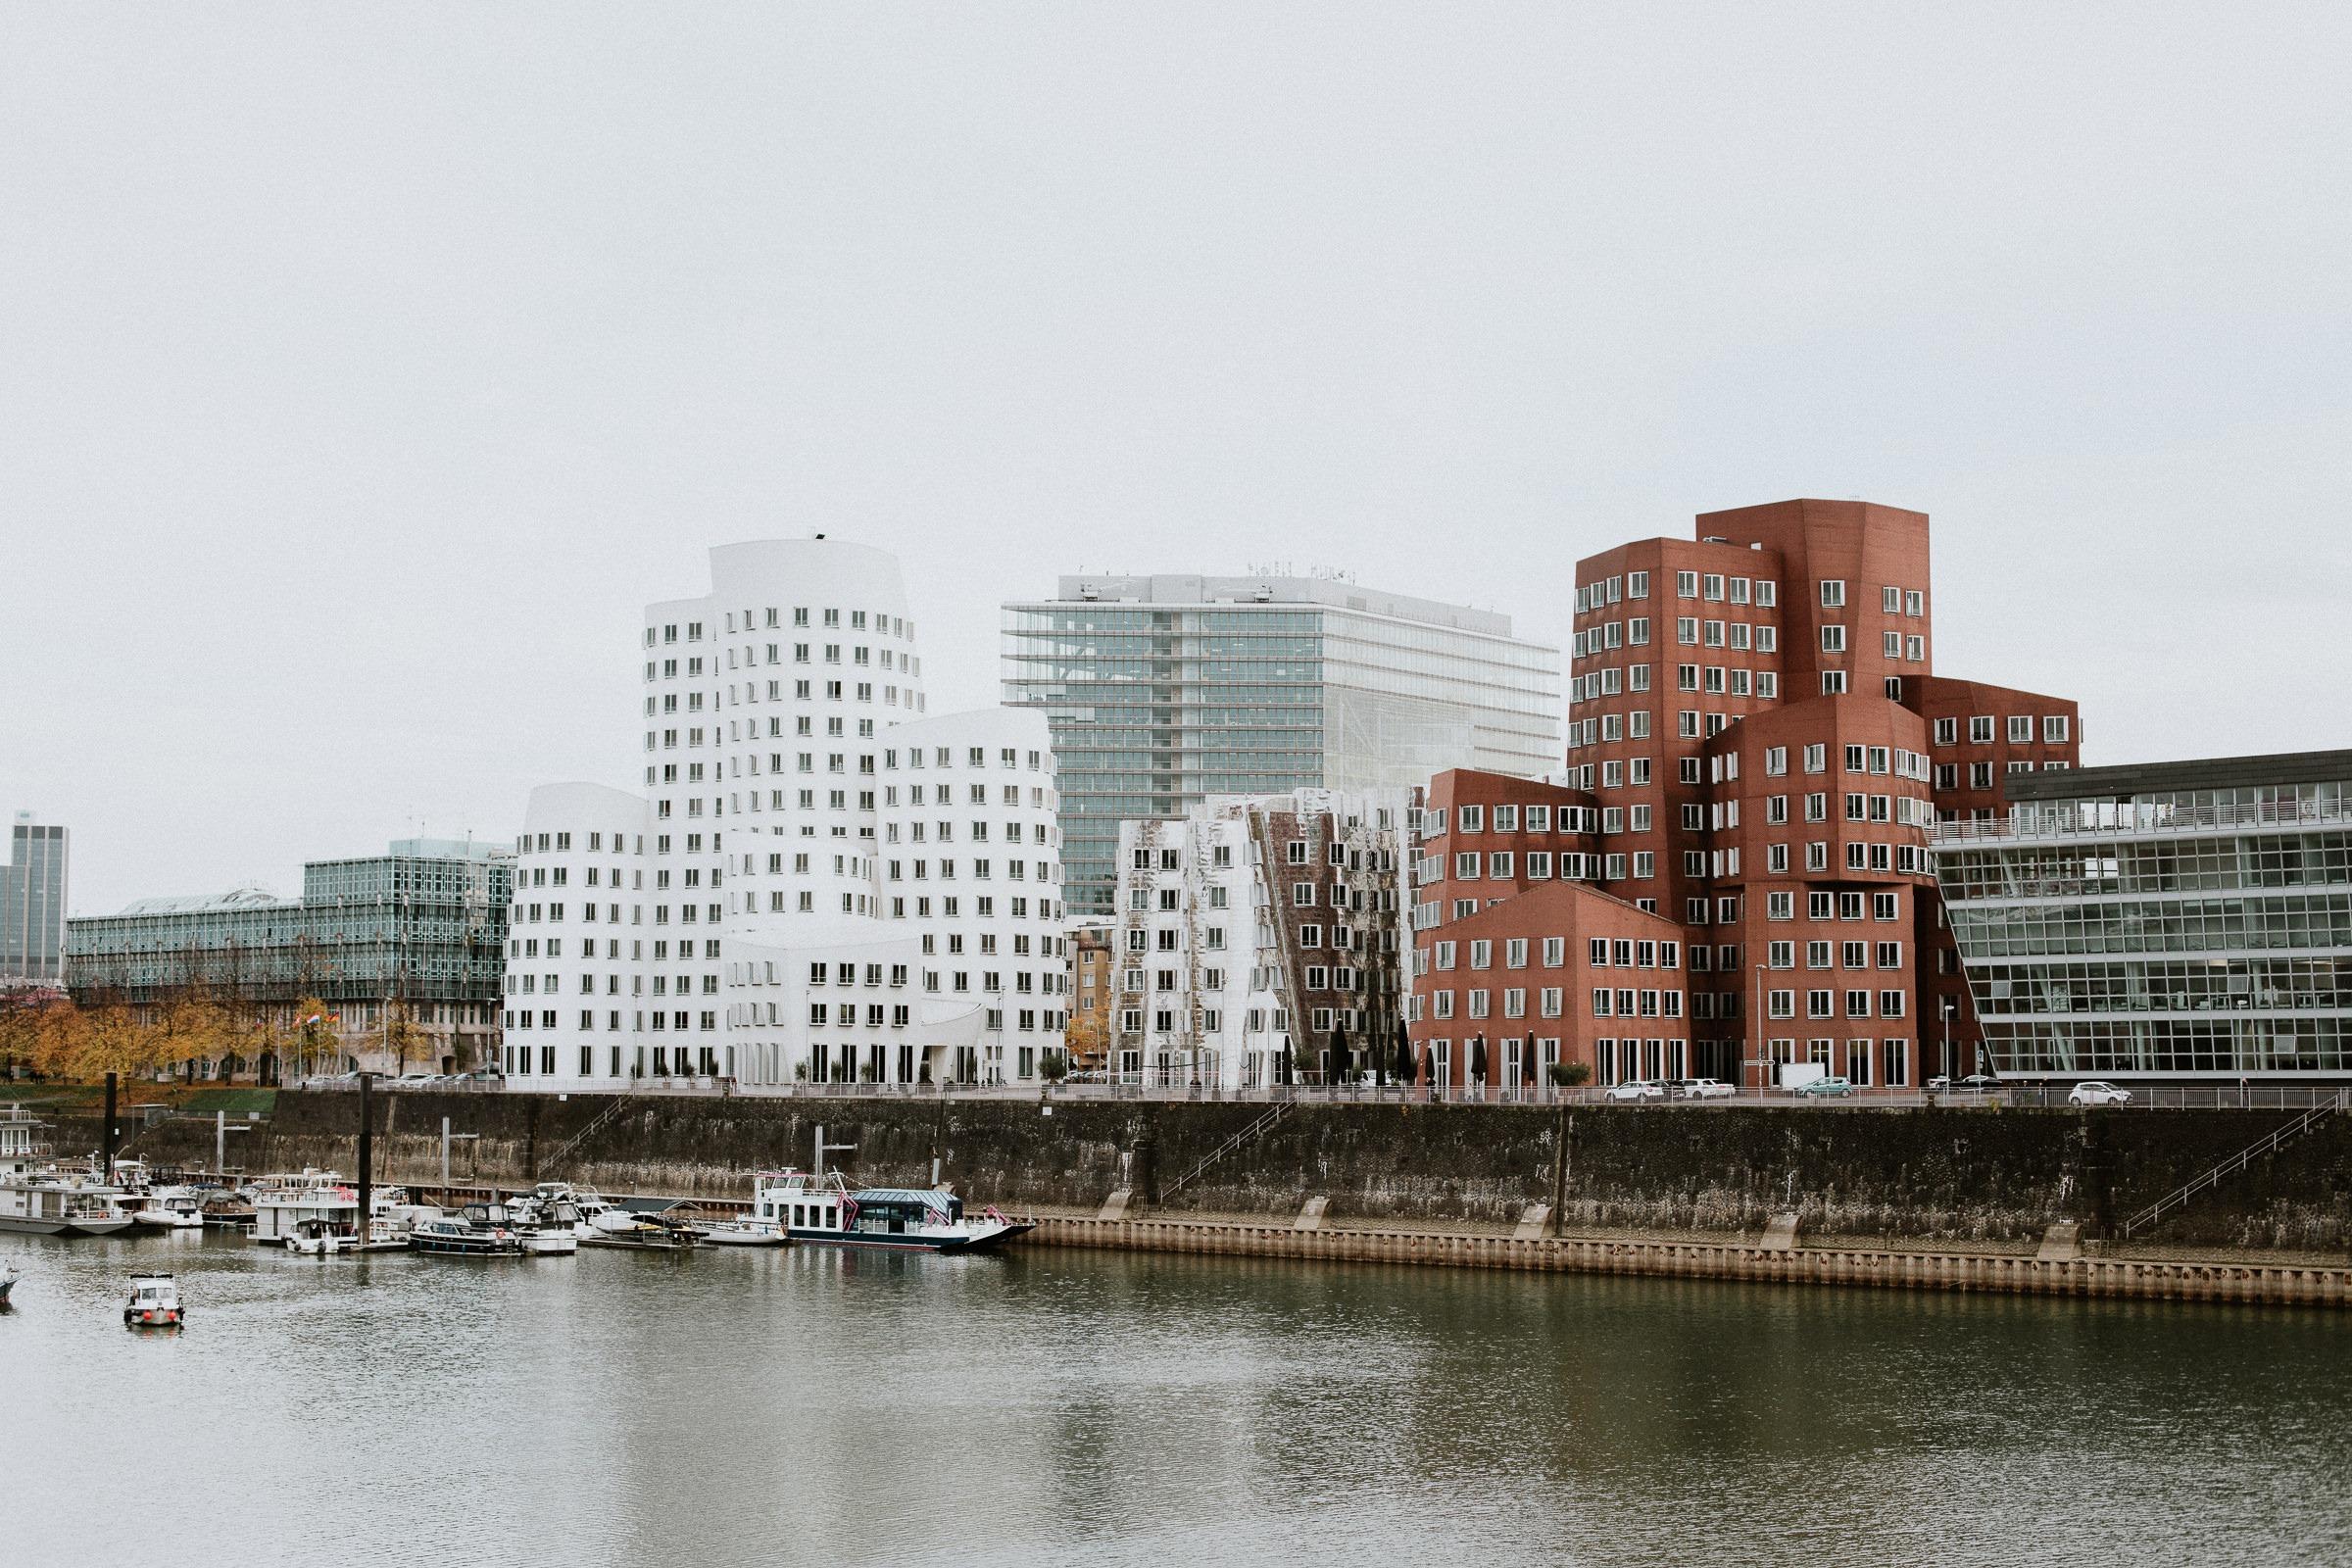 Dusseldorf - Medien hafen - Boussole magique